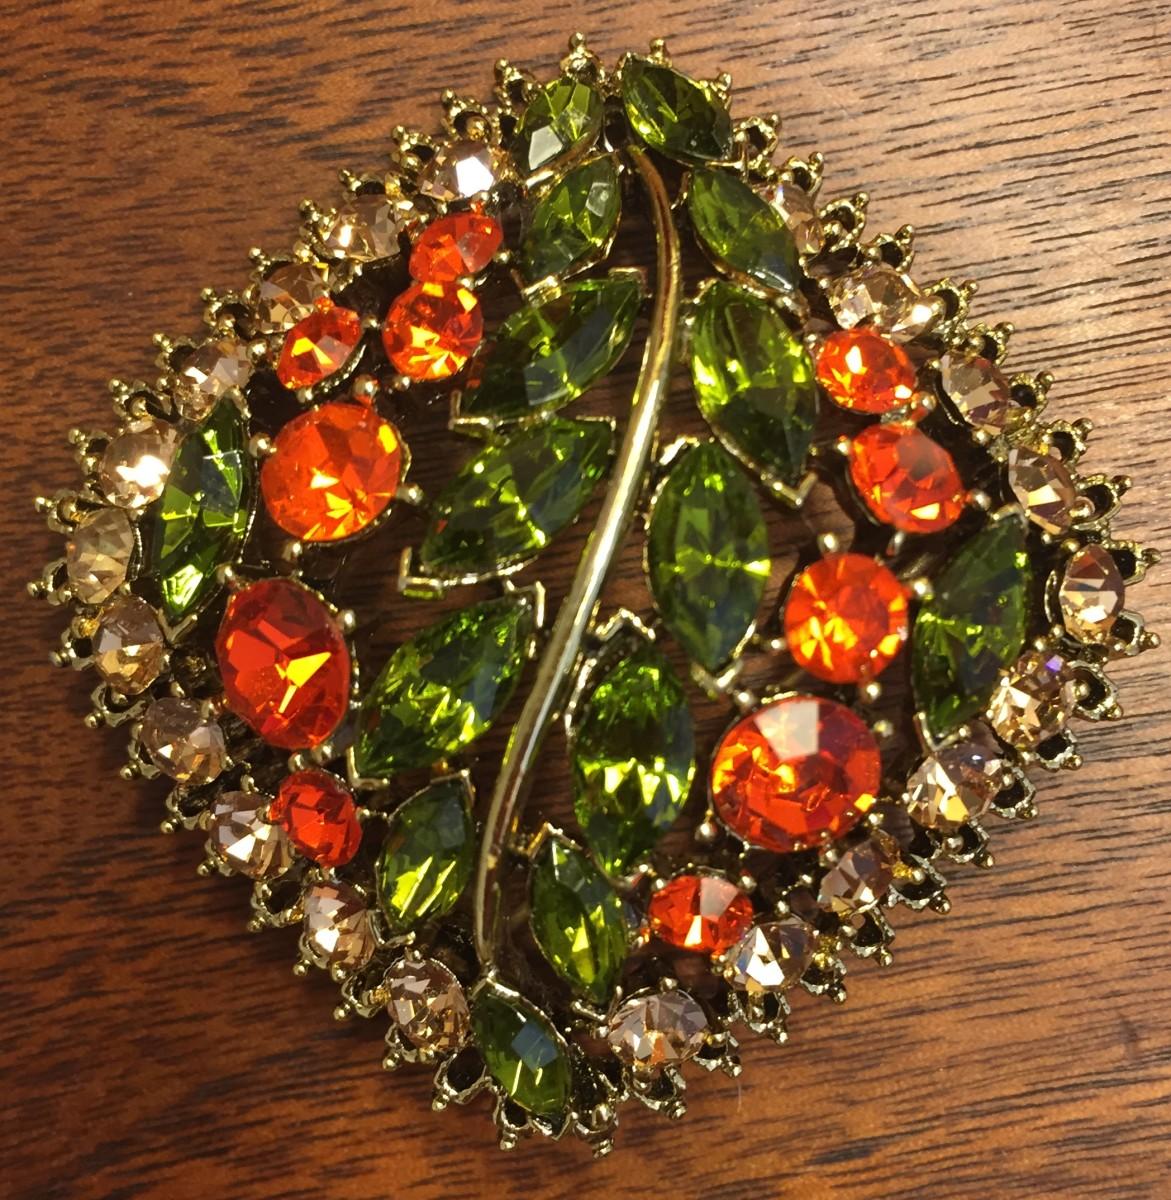 treasure-hunt-finding-and-identifying-midcentury-costume-jewelry